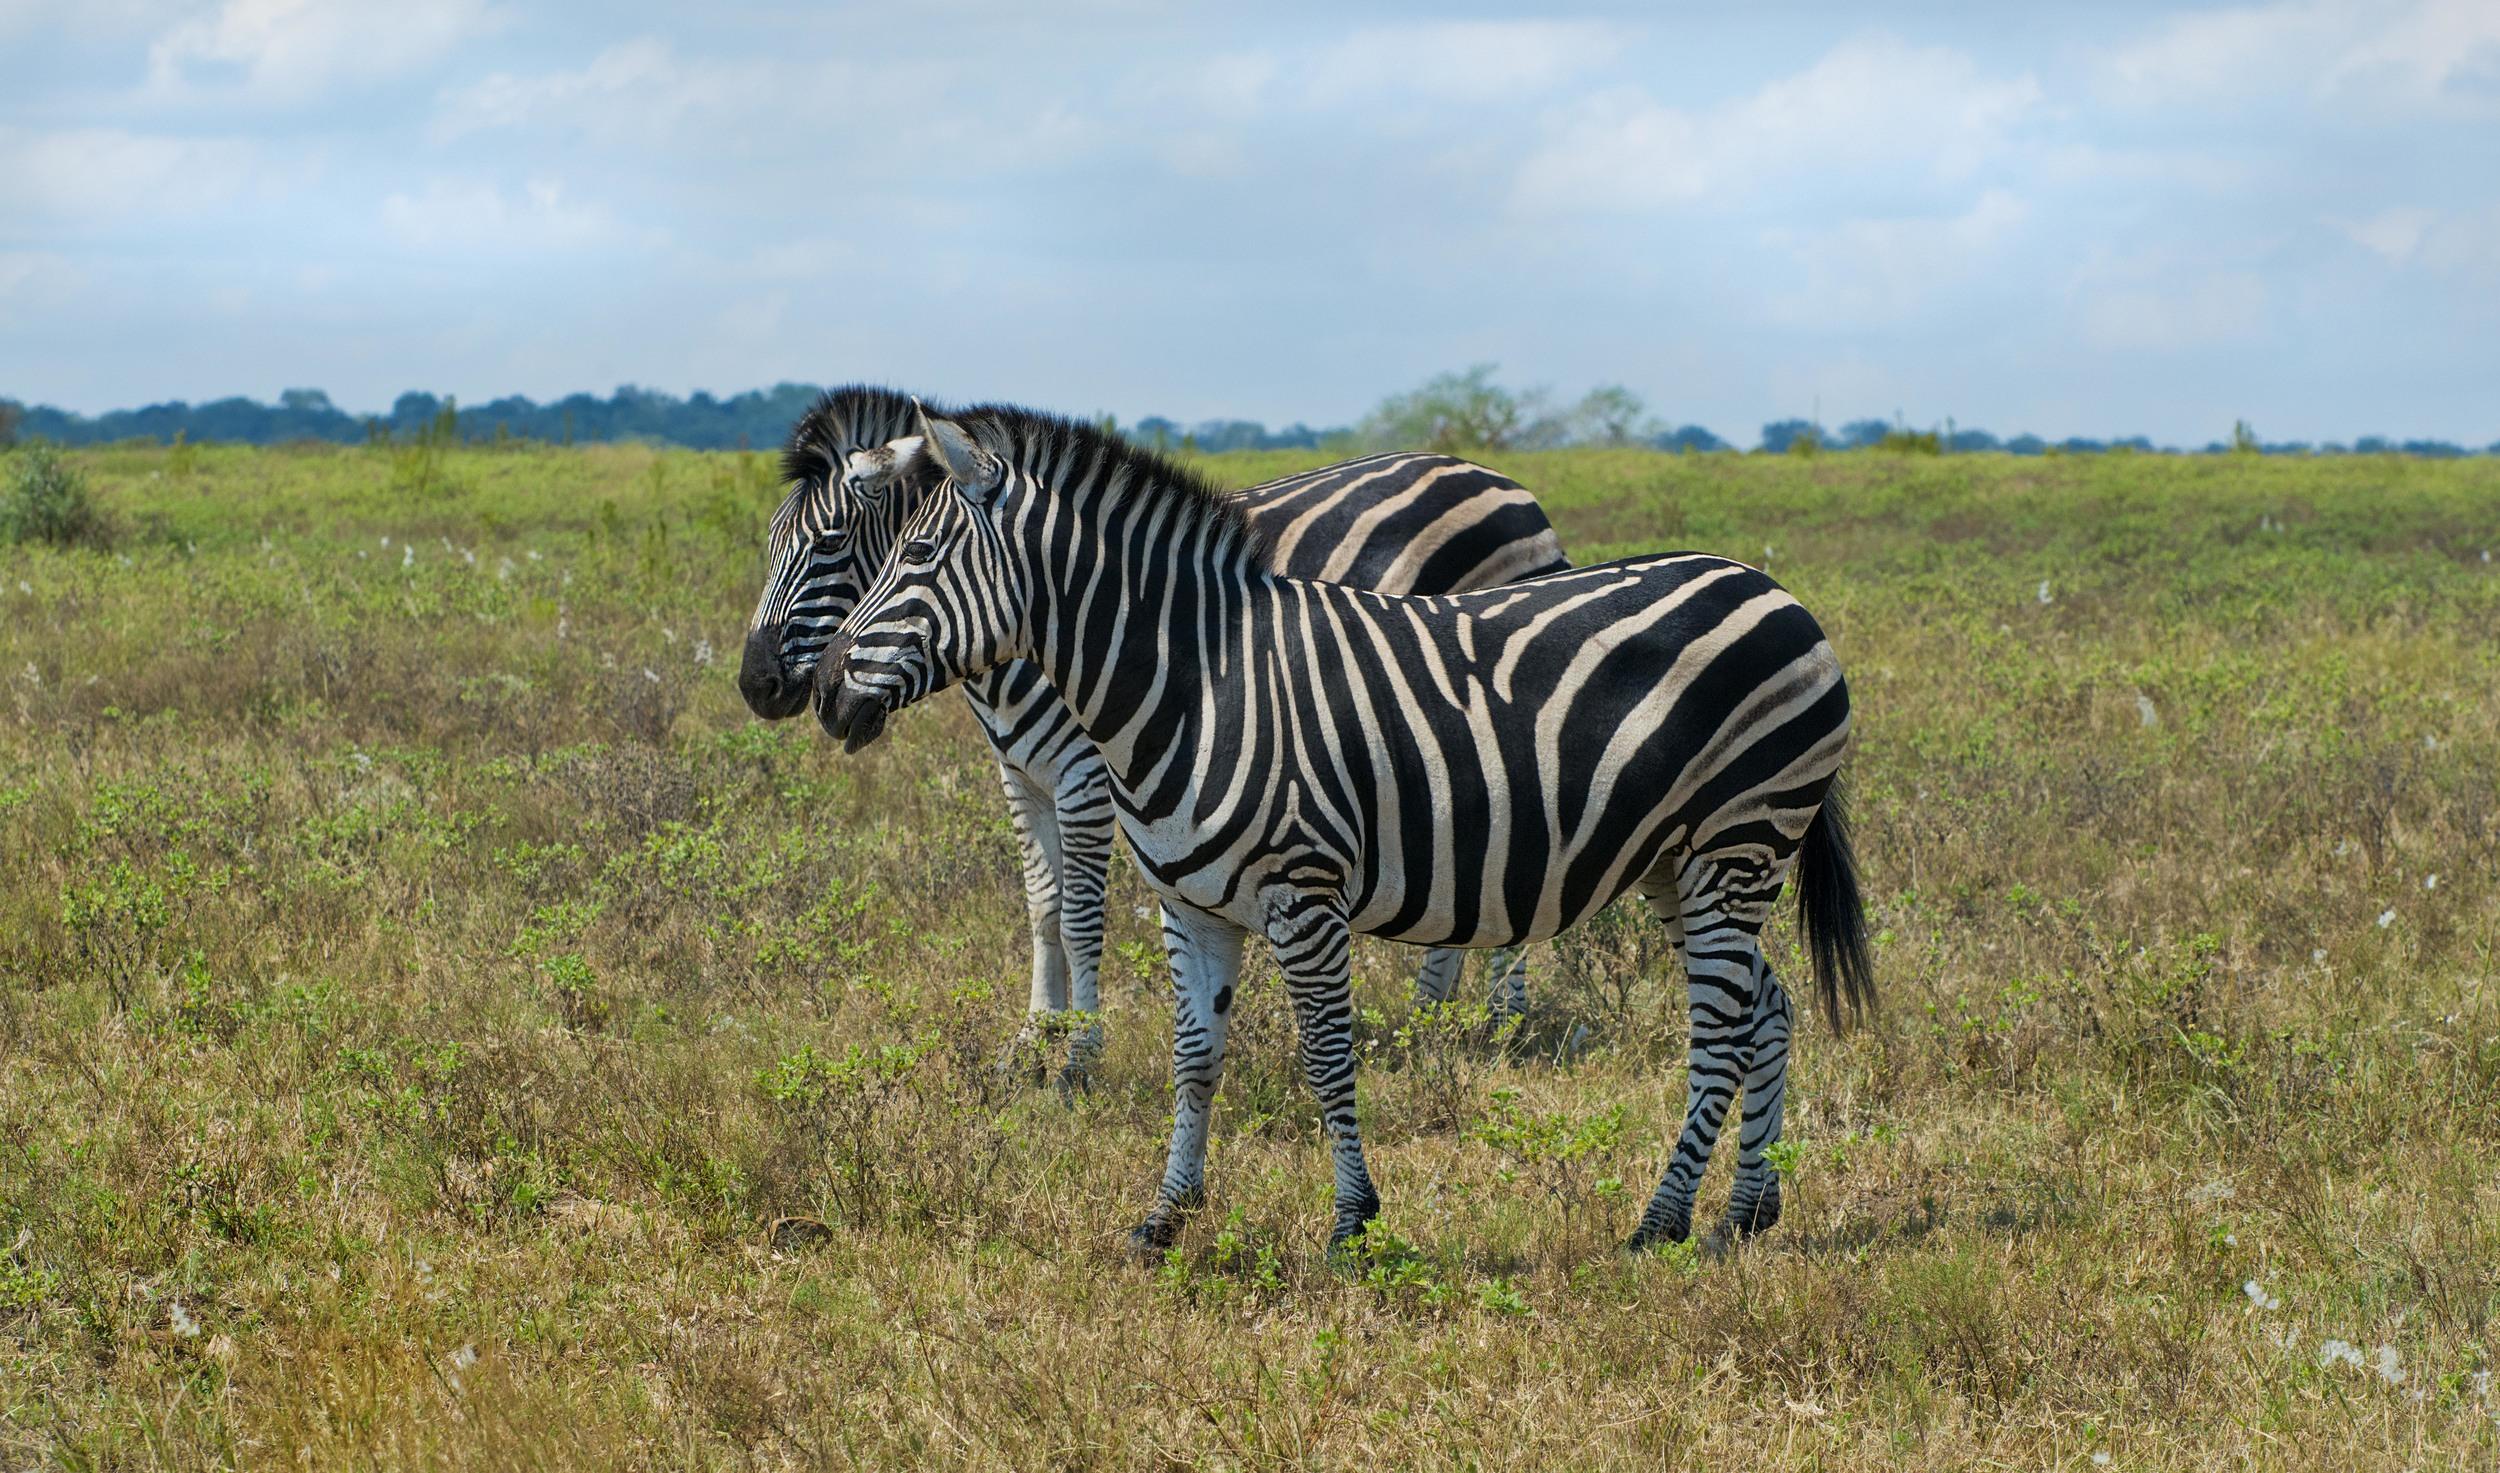 130420_DSC3742 Zebras on the Bushveld.jpg